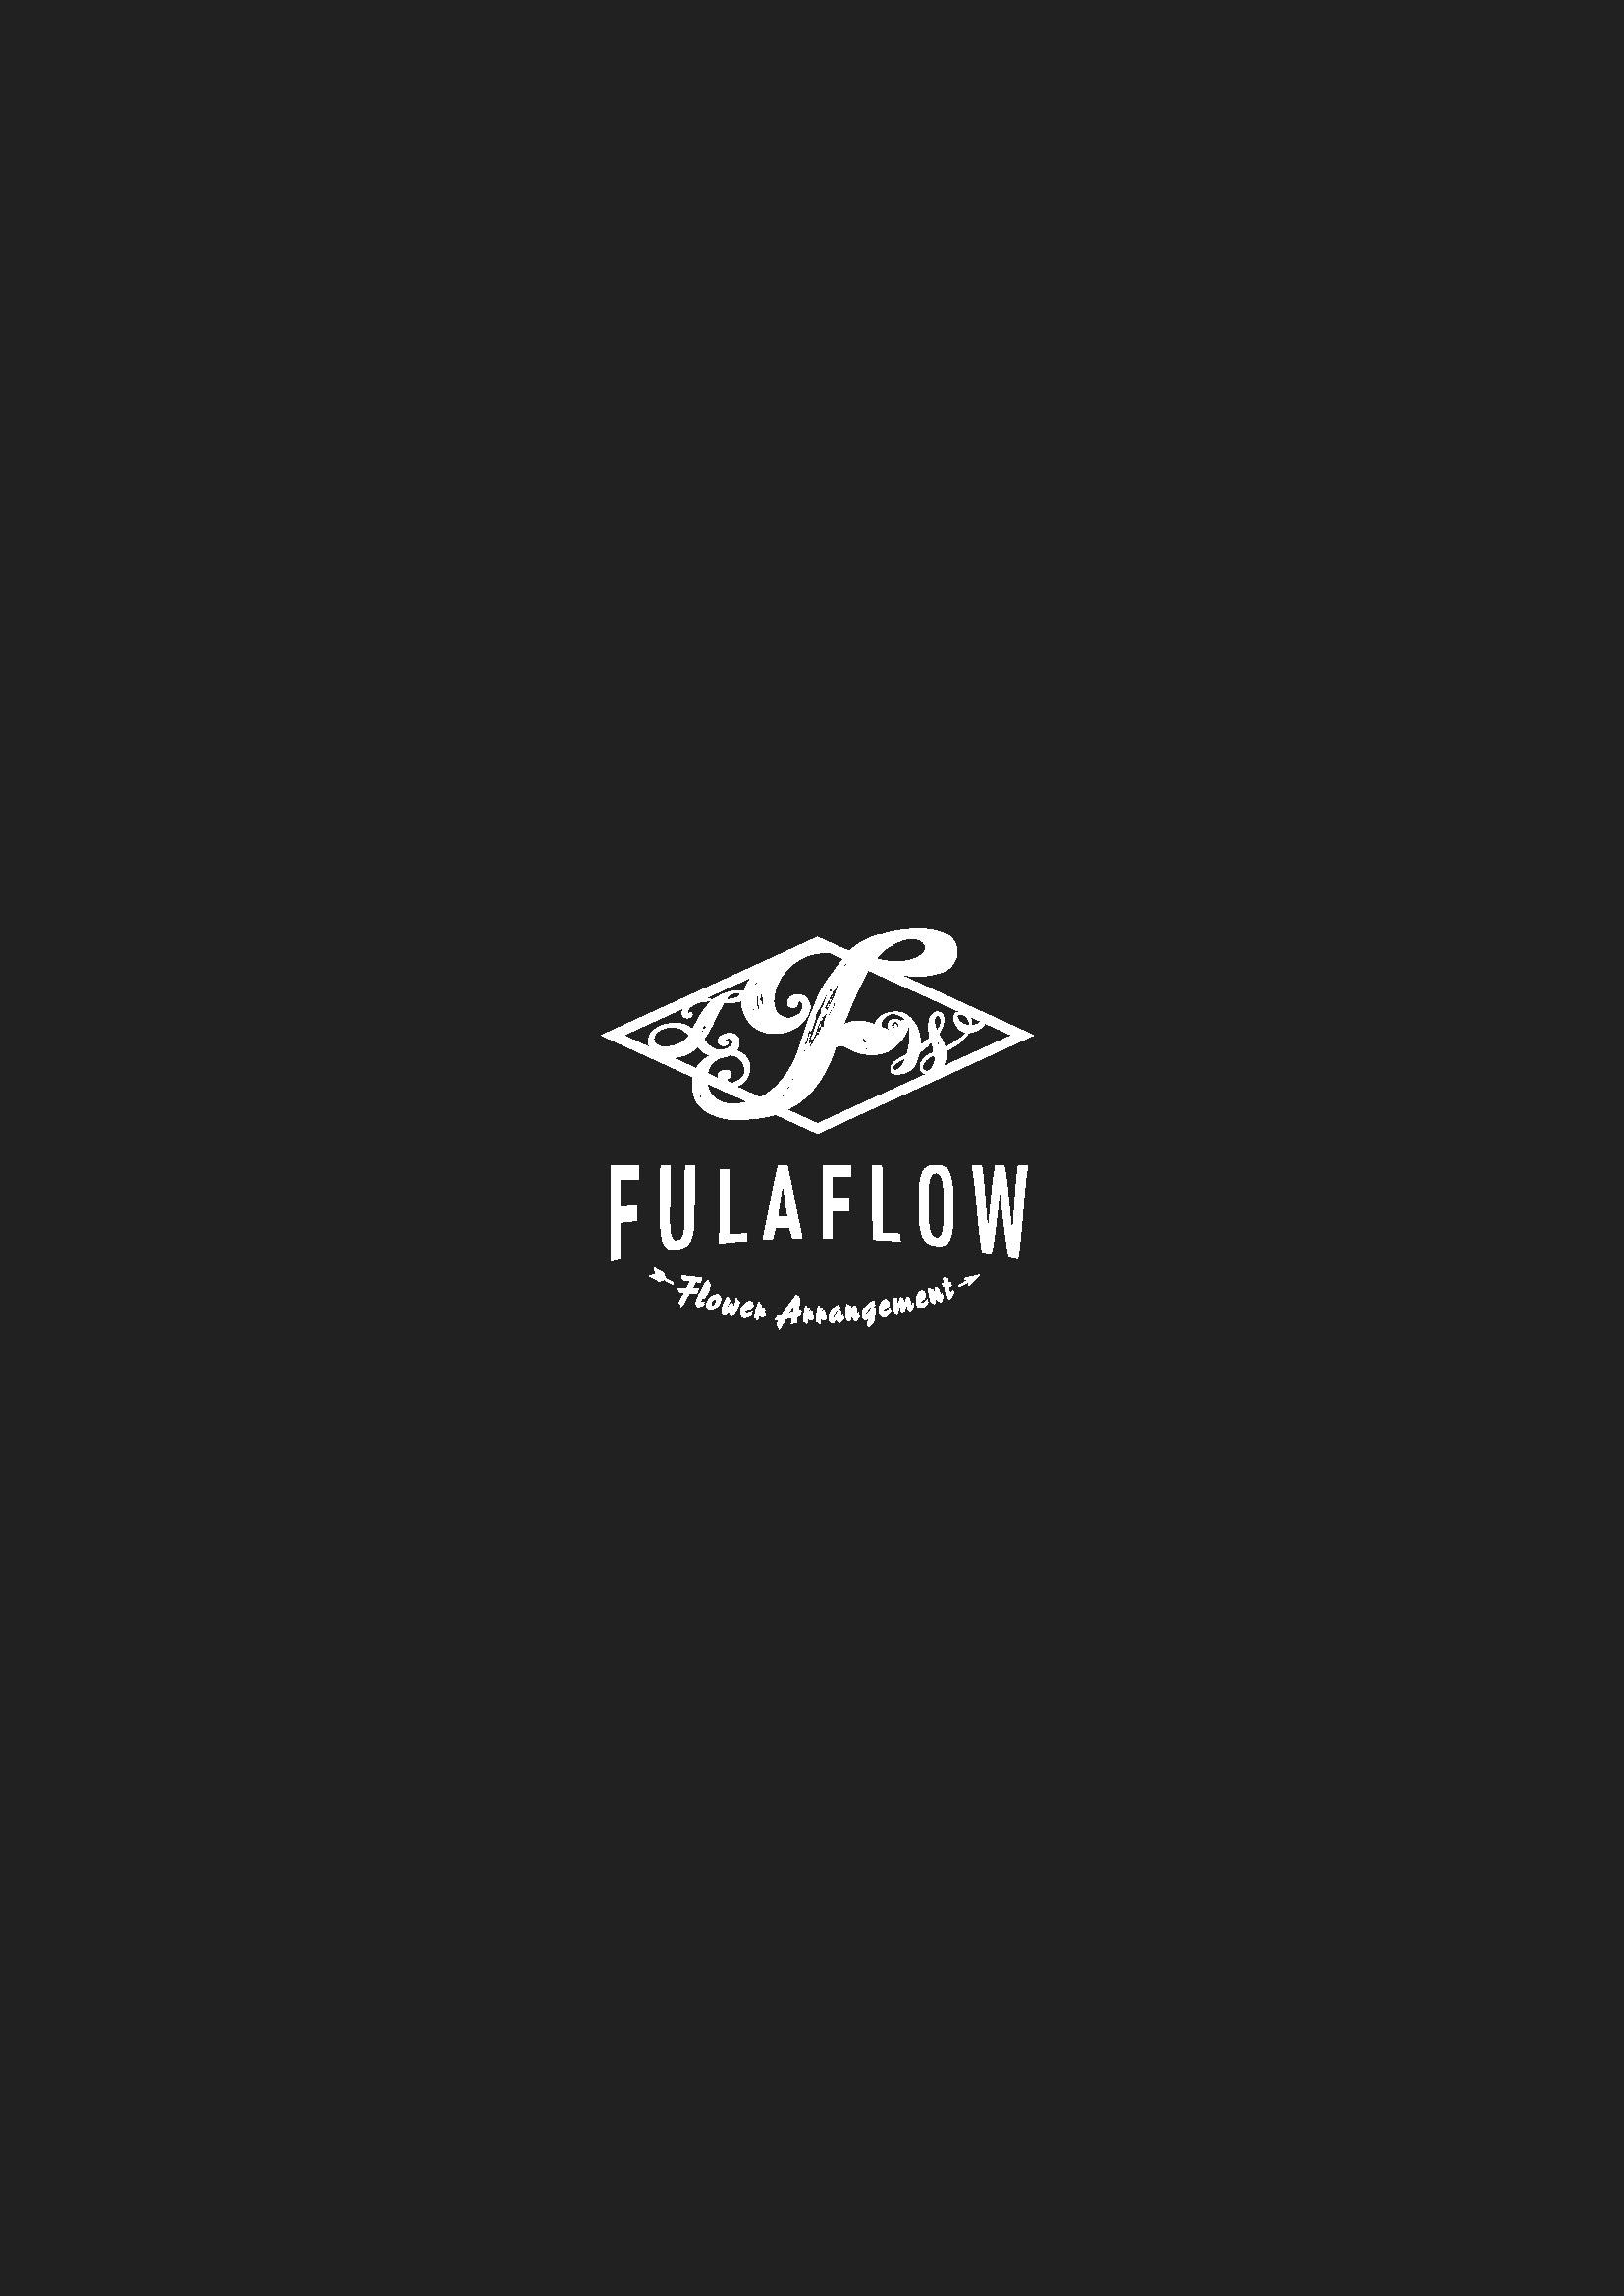 fulaflow